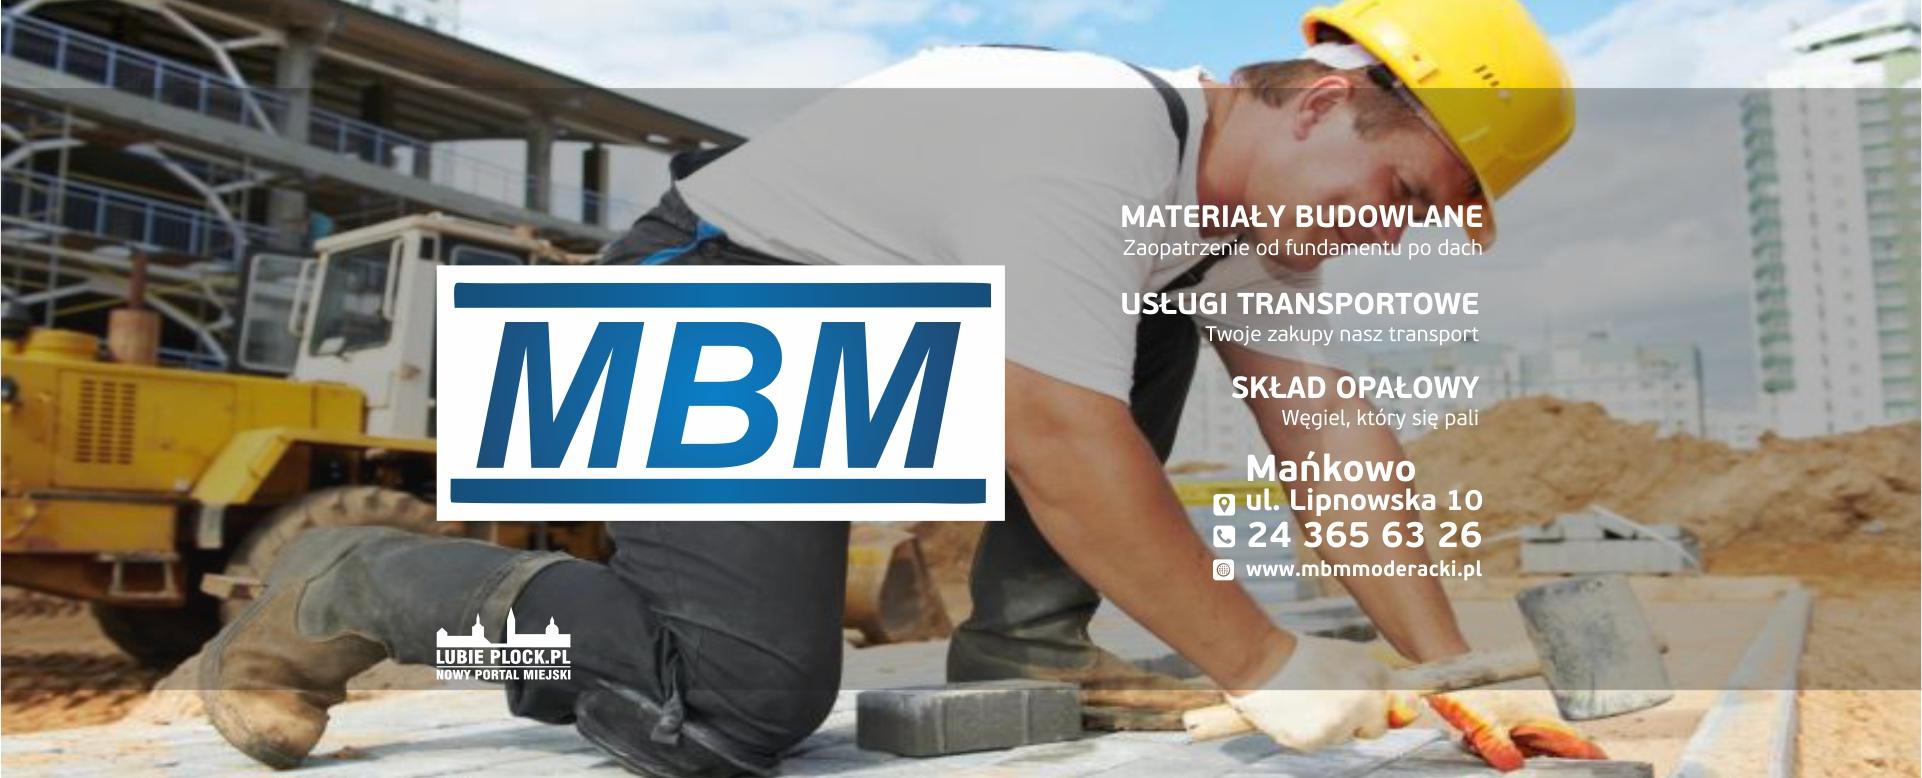 mbm2-small